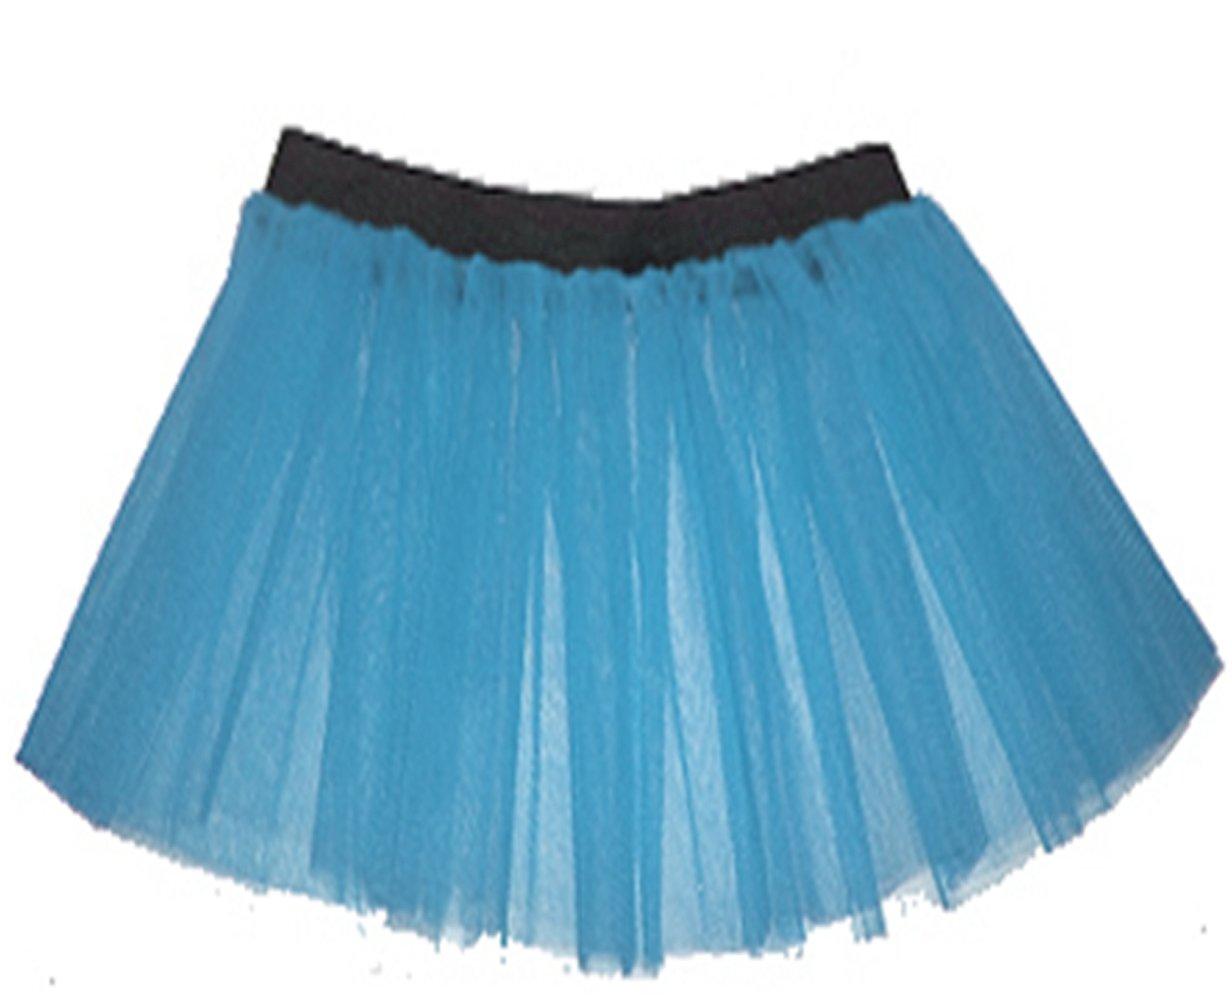 A-Express Tütü Rock Neon Tutu Netz Tüllrock 3 Lagen Petticoat für verrücktes Kleid Party Kostüm